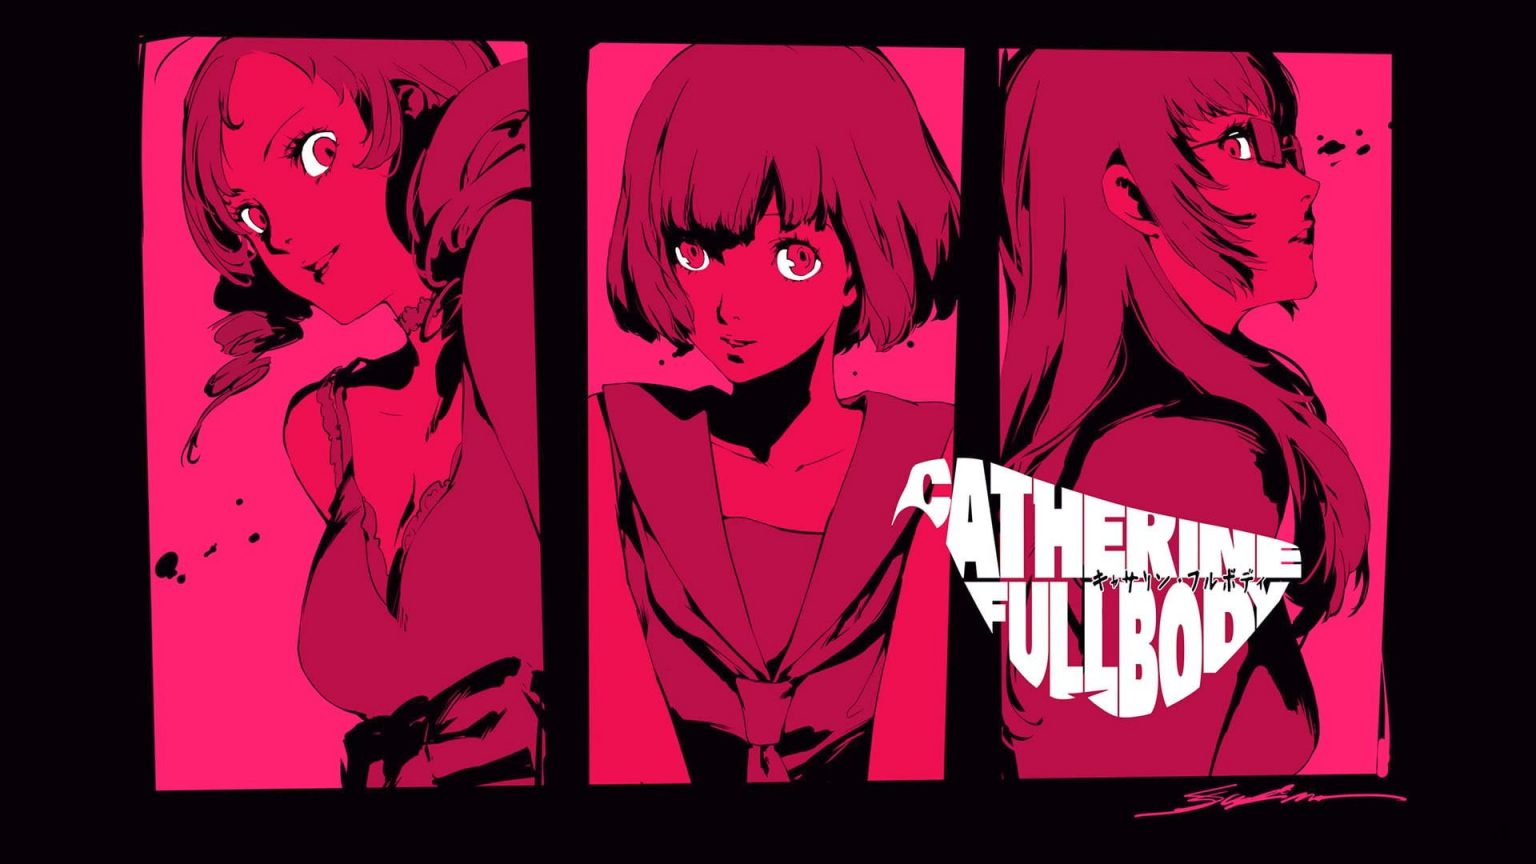 Catherine Full Body Apk iOS Latest Version Free Download